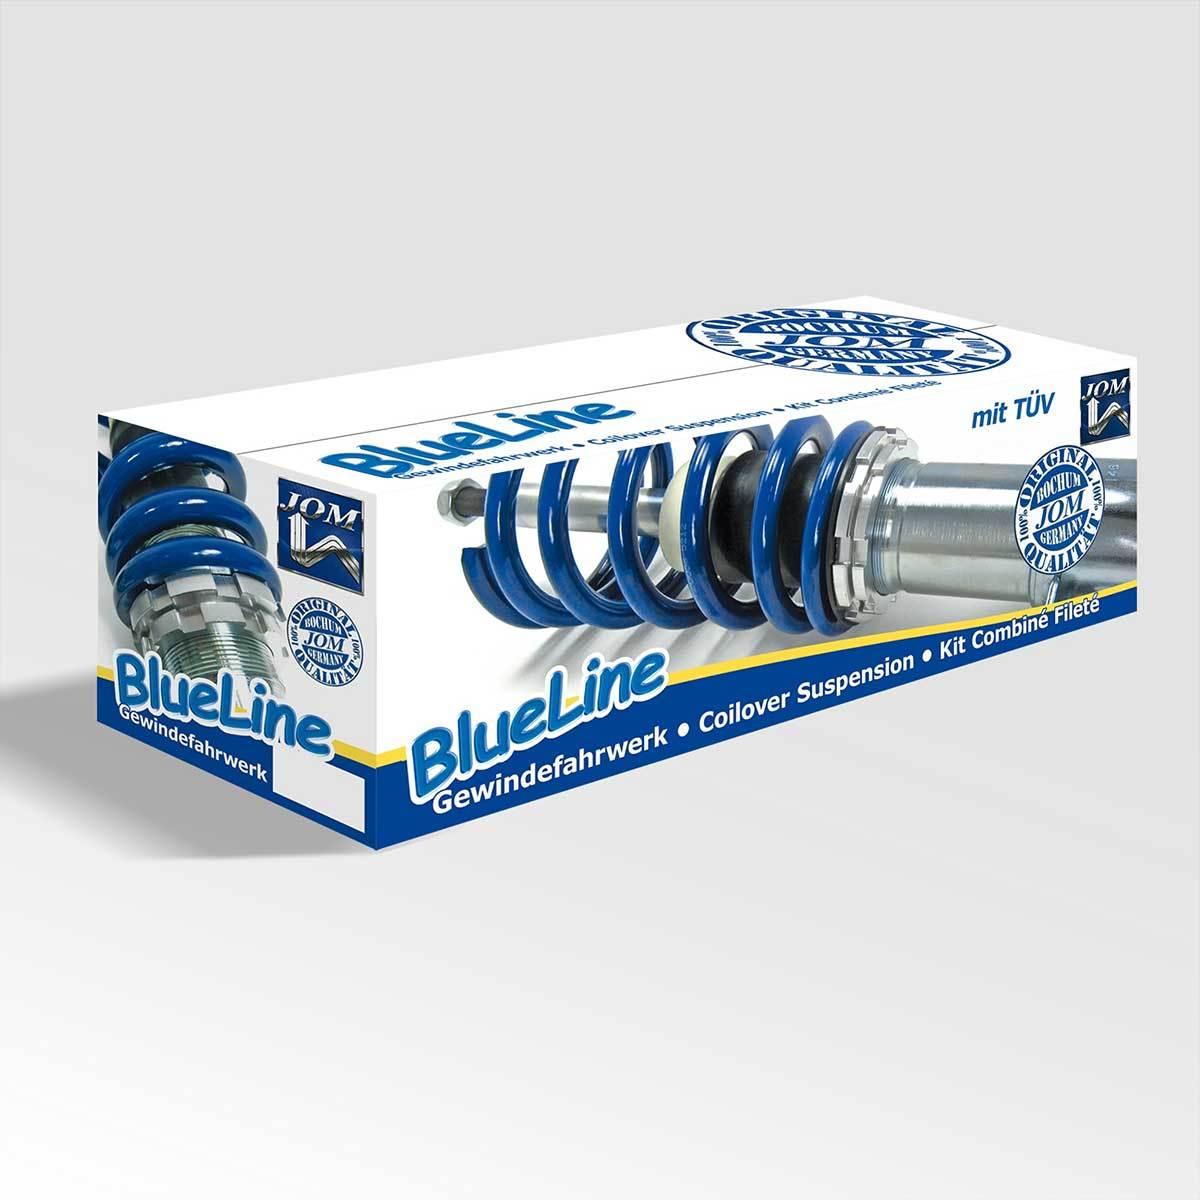 Коробка с койловерами от фирмы JOM Blueline 741154